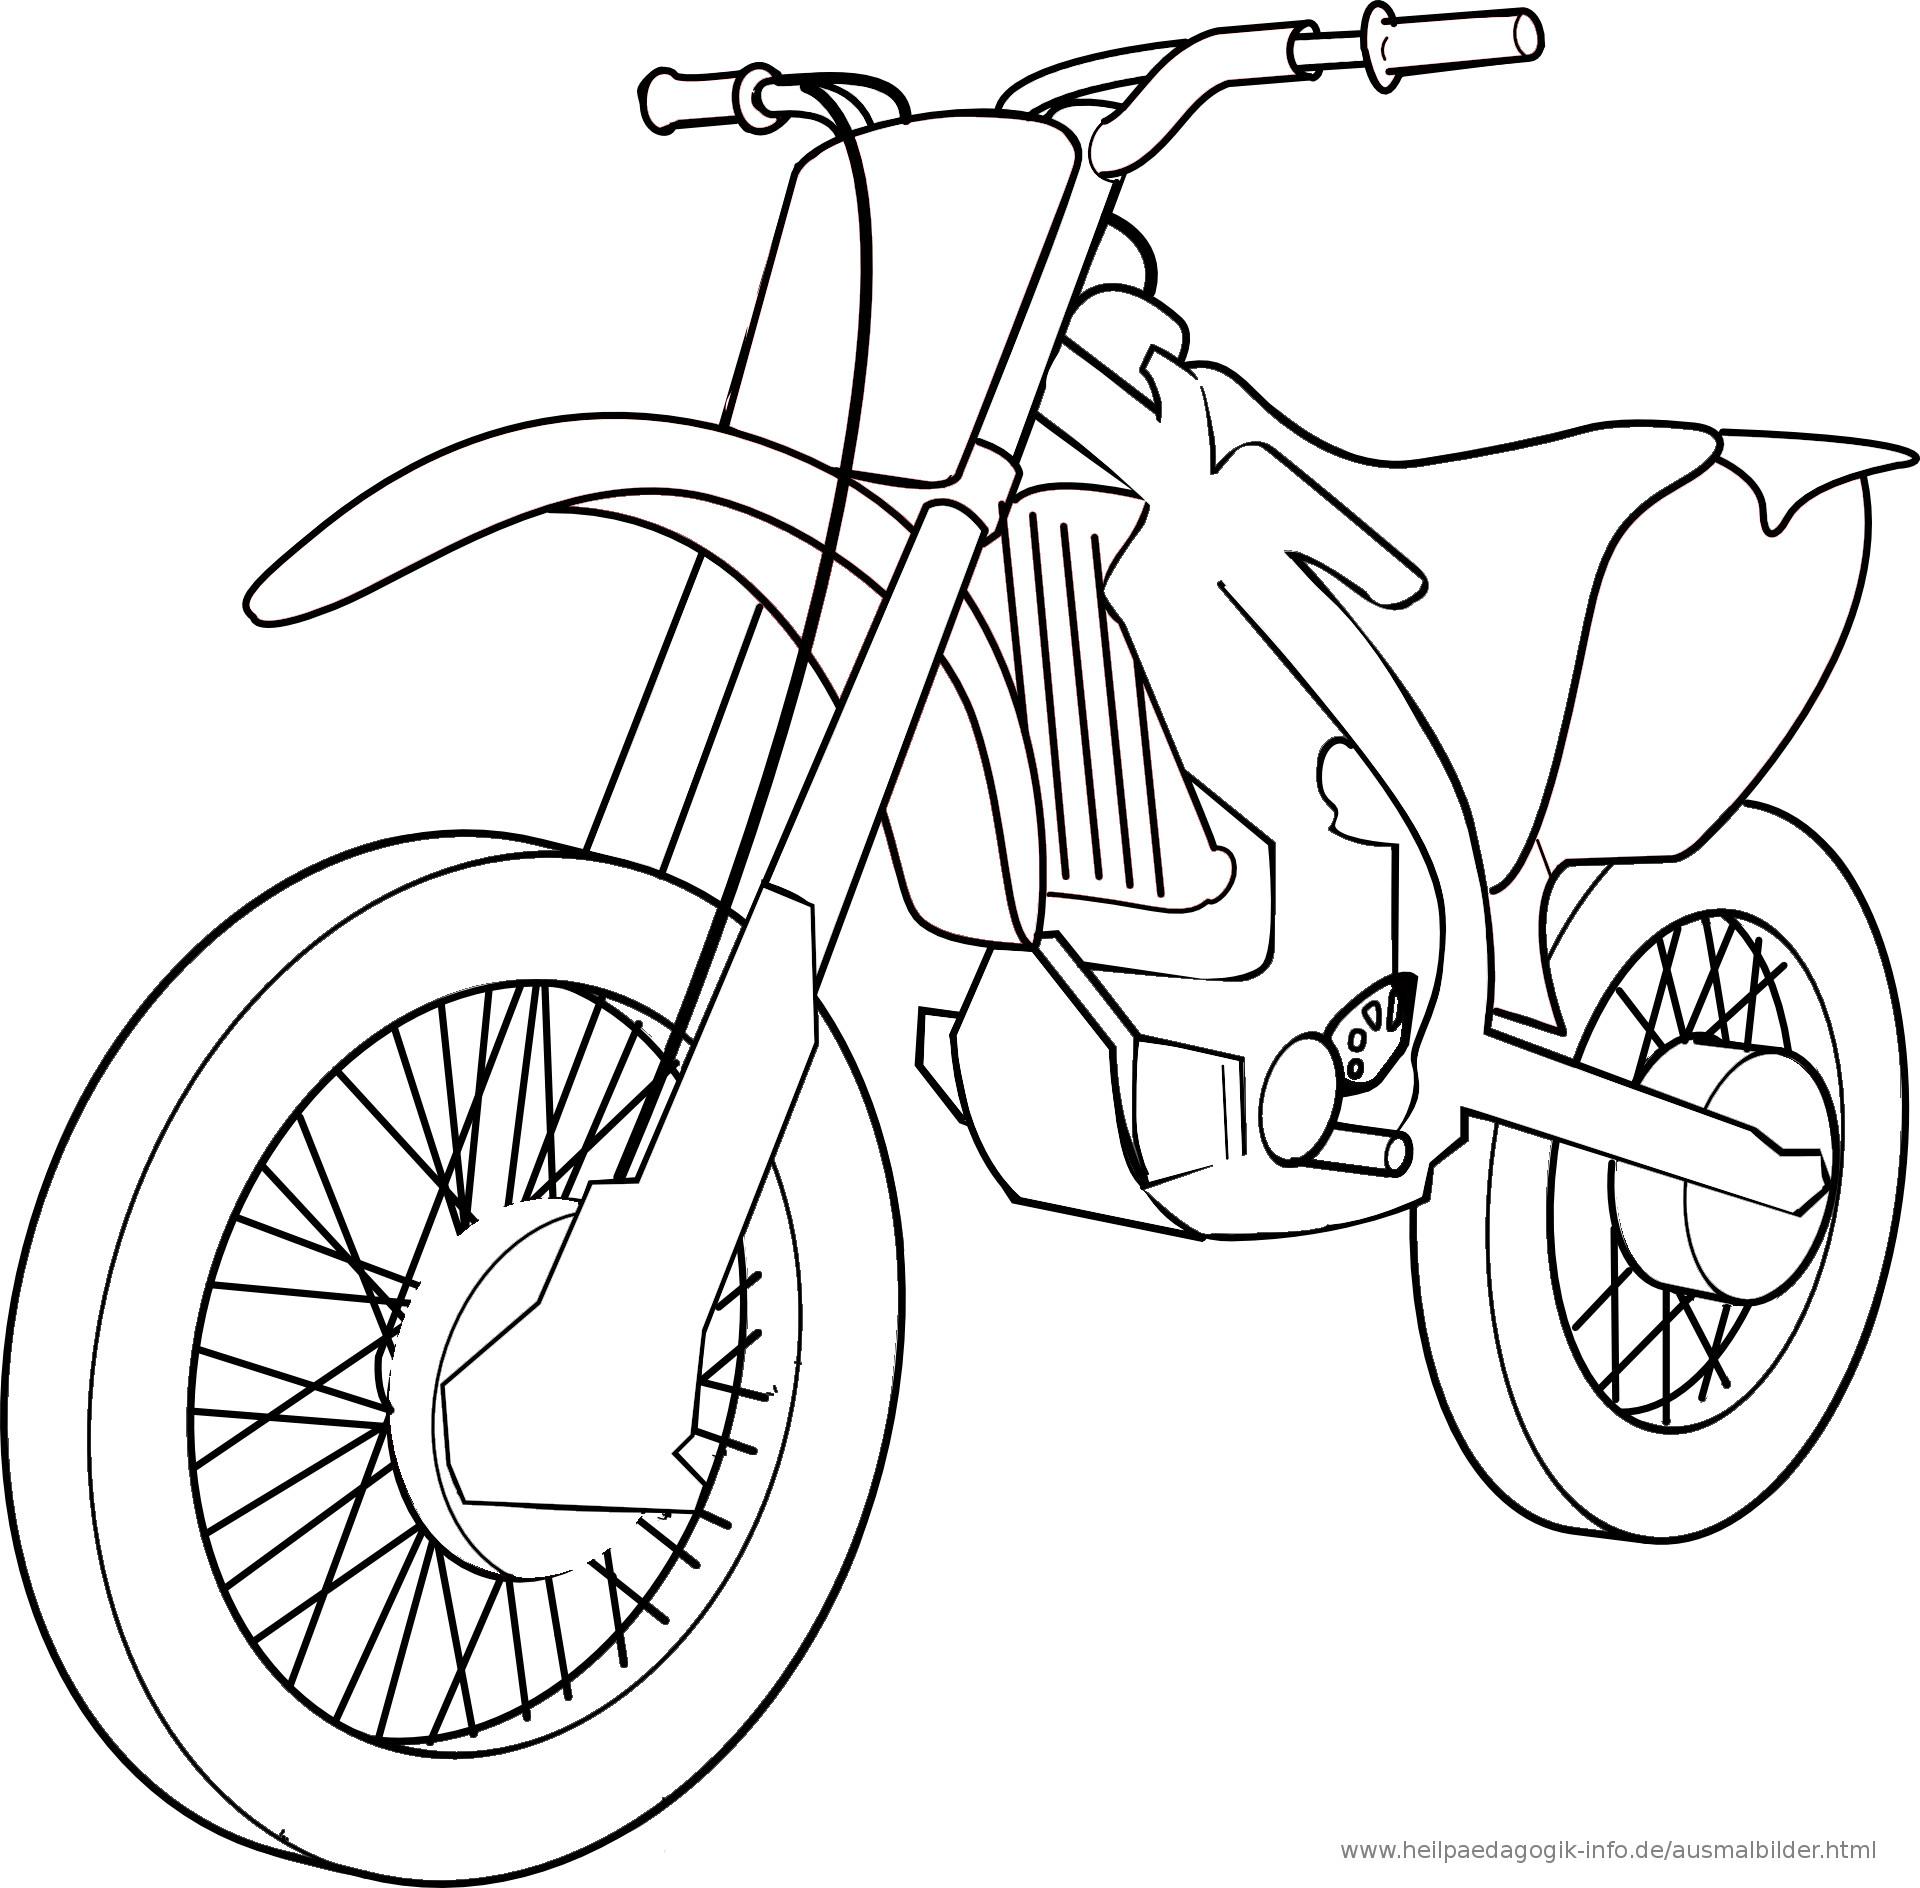 Ausmalbilder Fahrrad  ausmalbilder motorrad ktm Archives Coloriagenoel Store